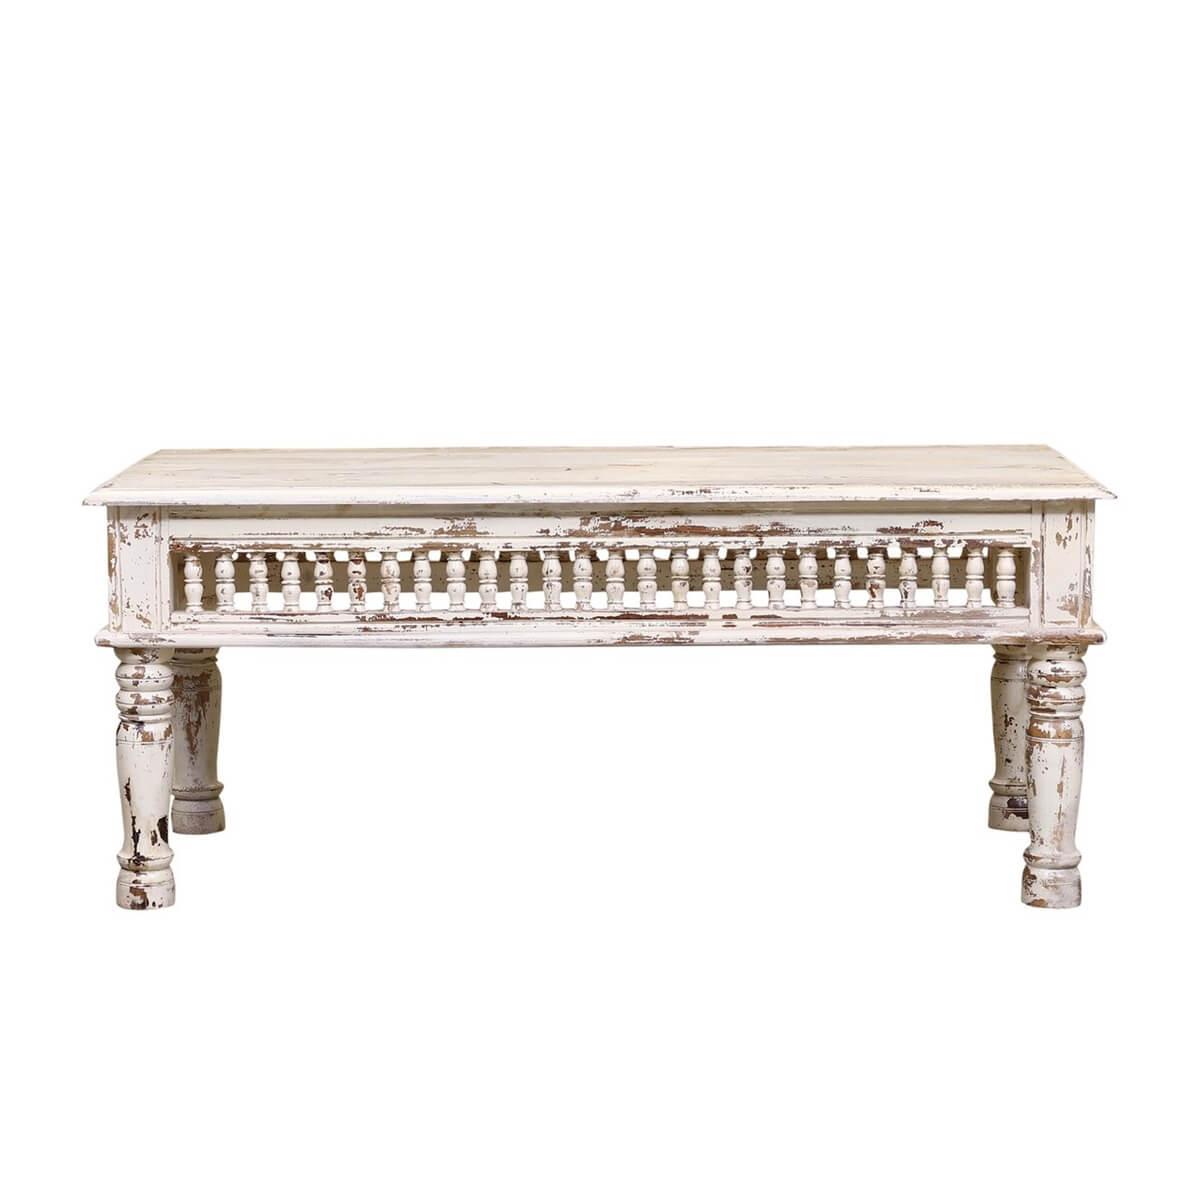 bowlus white distressed reclaimed wood railing rustic coffee table